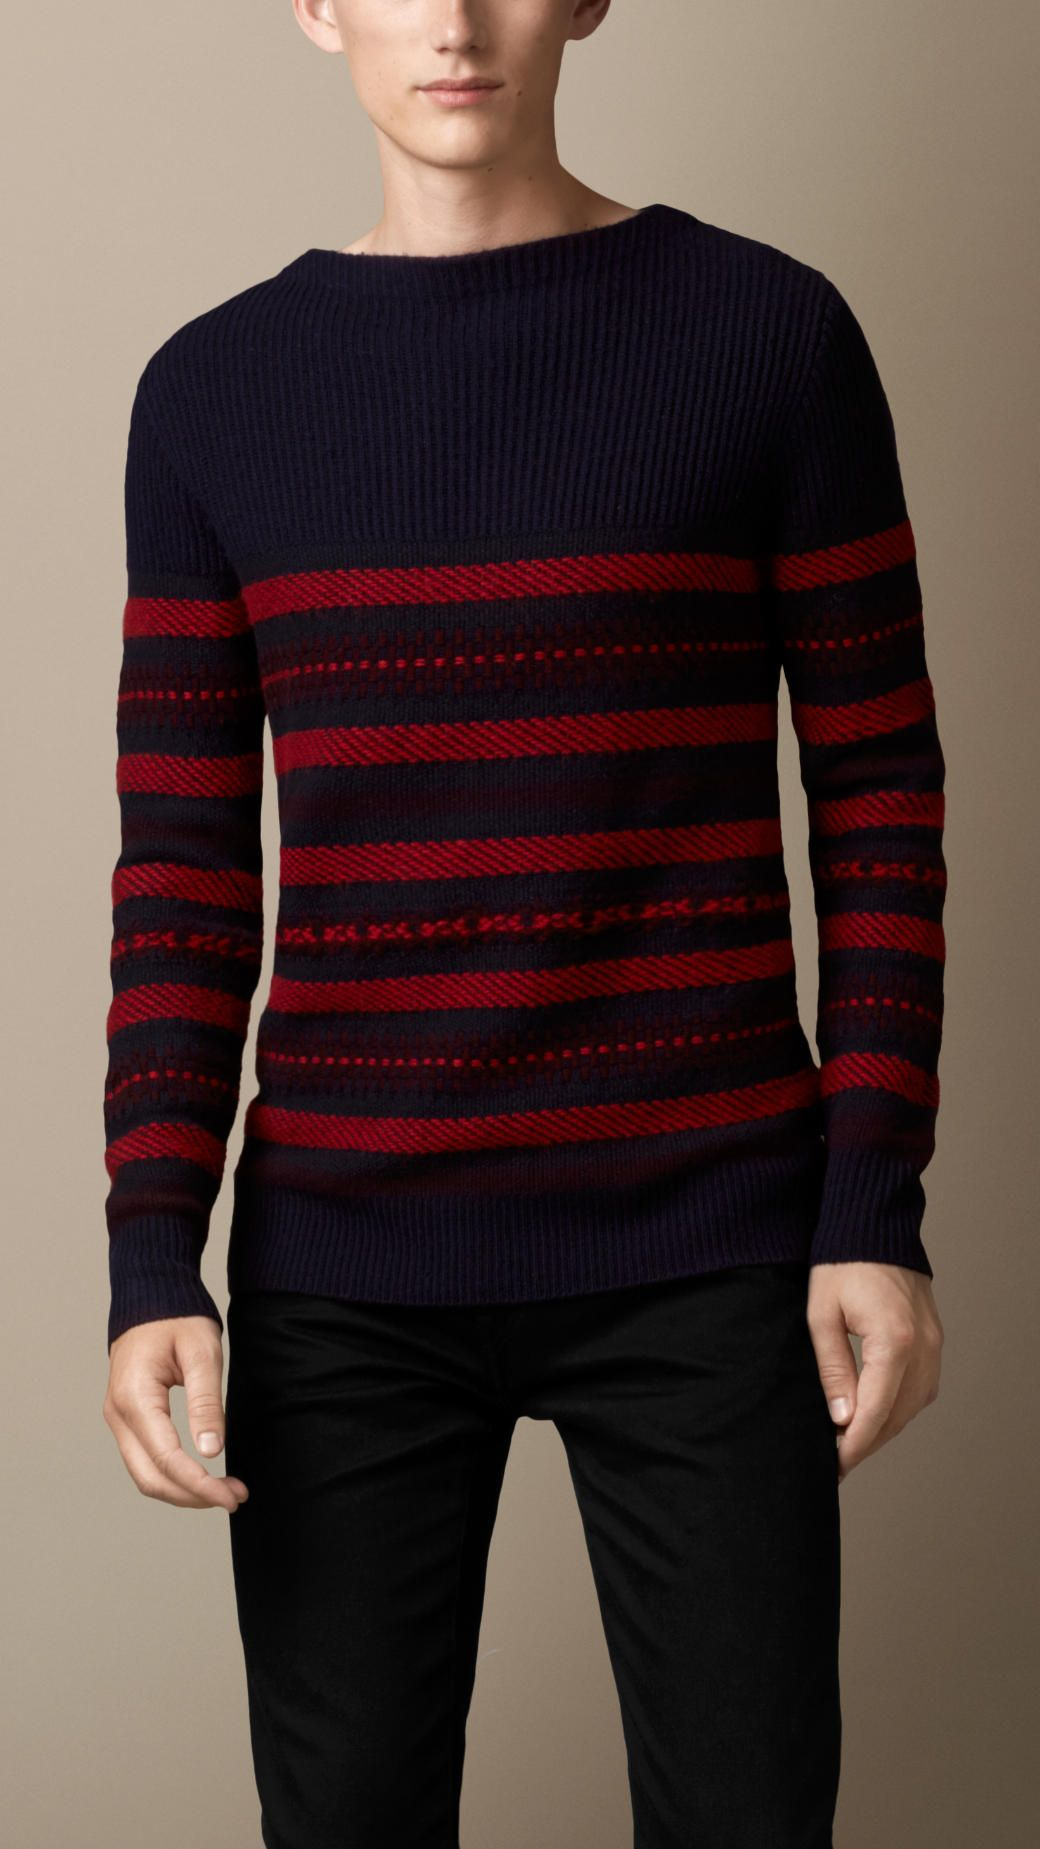 Men S Hoodies Sweatshirts Burberry Mens Fashion Sweaters Menswear Sweaters [ 1849 x 1040 Pixel ]